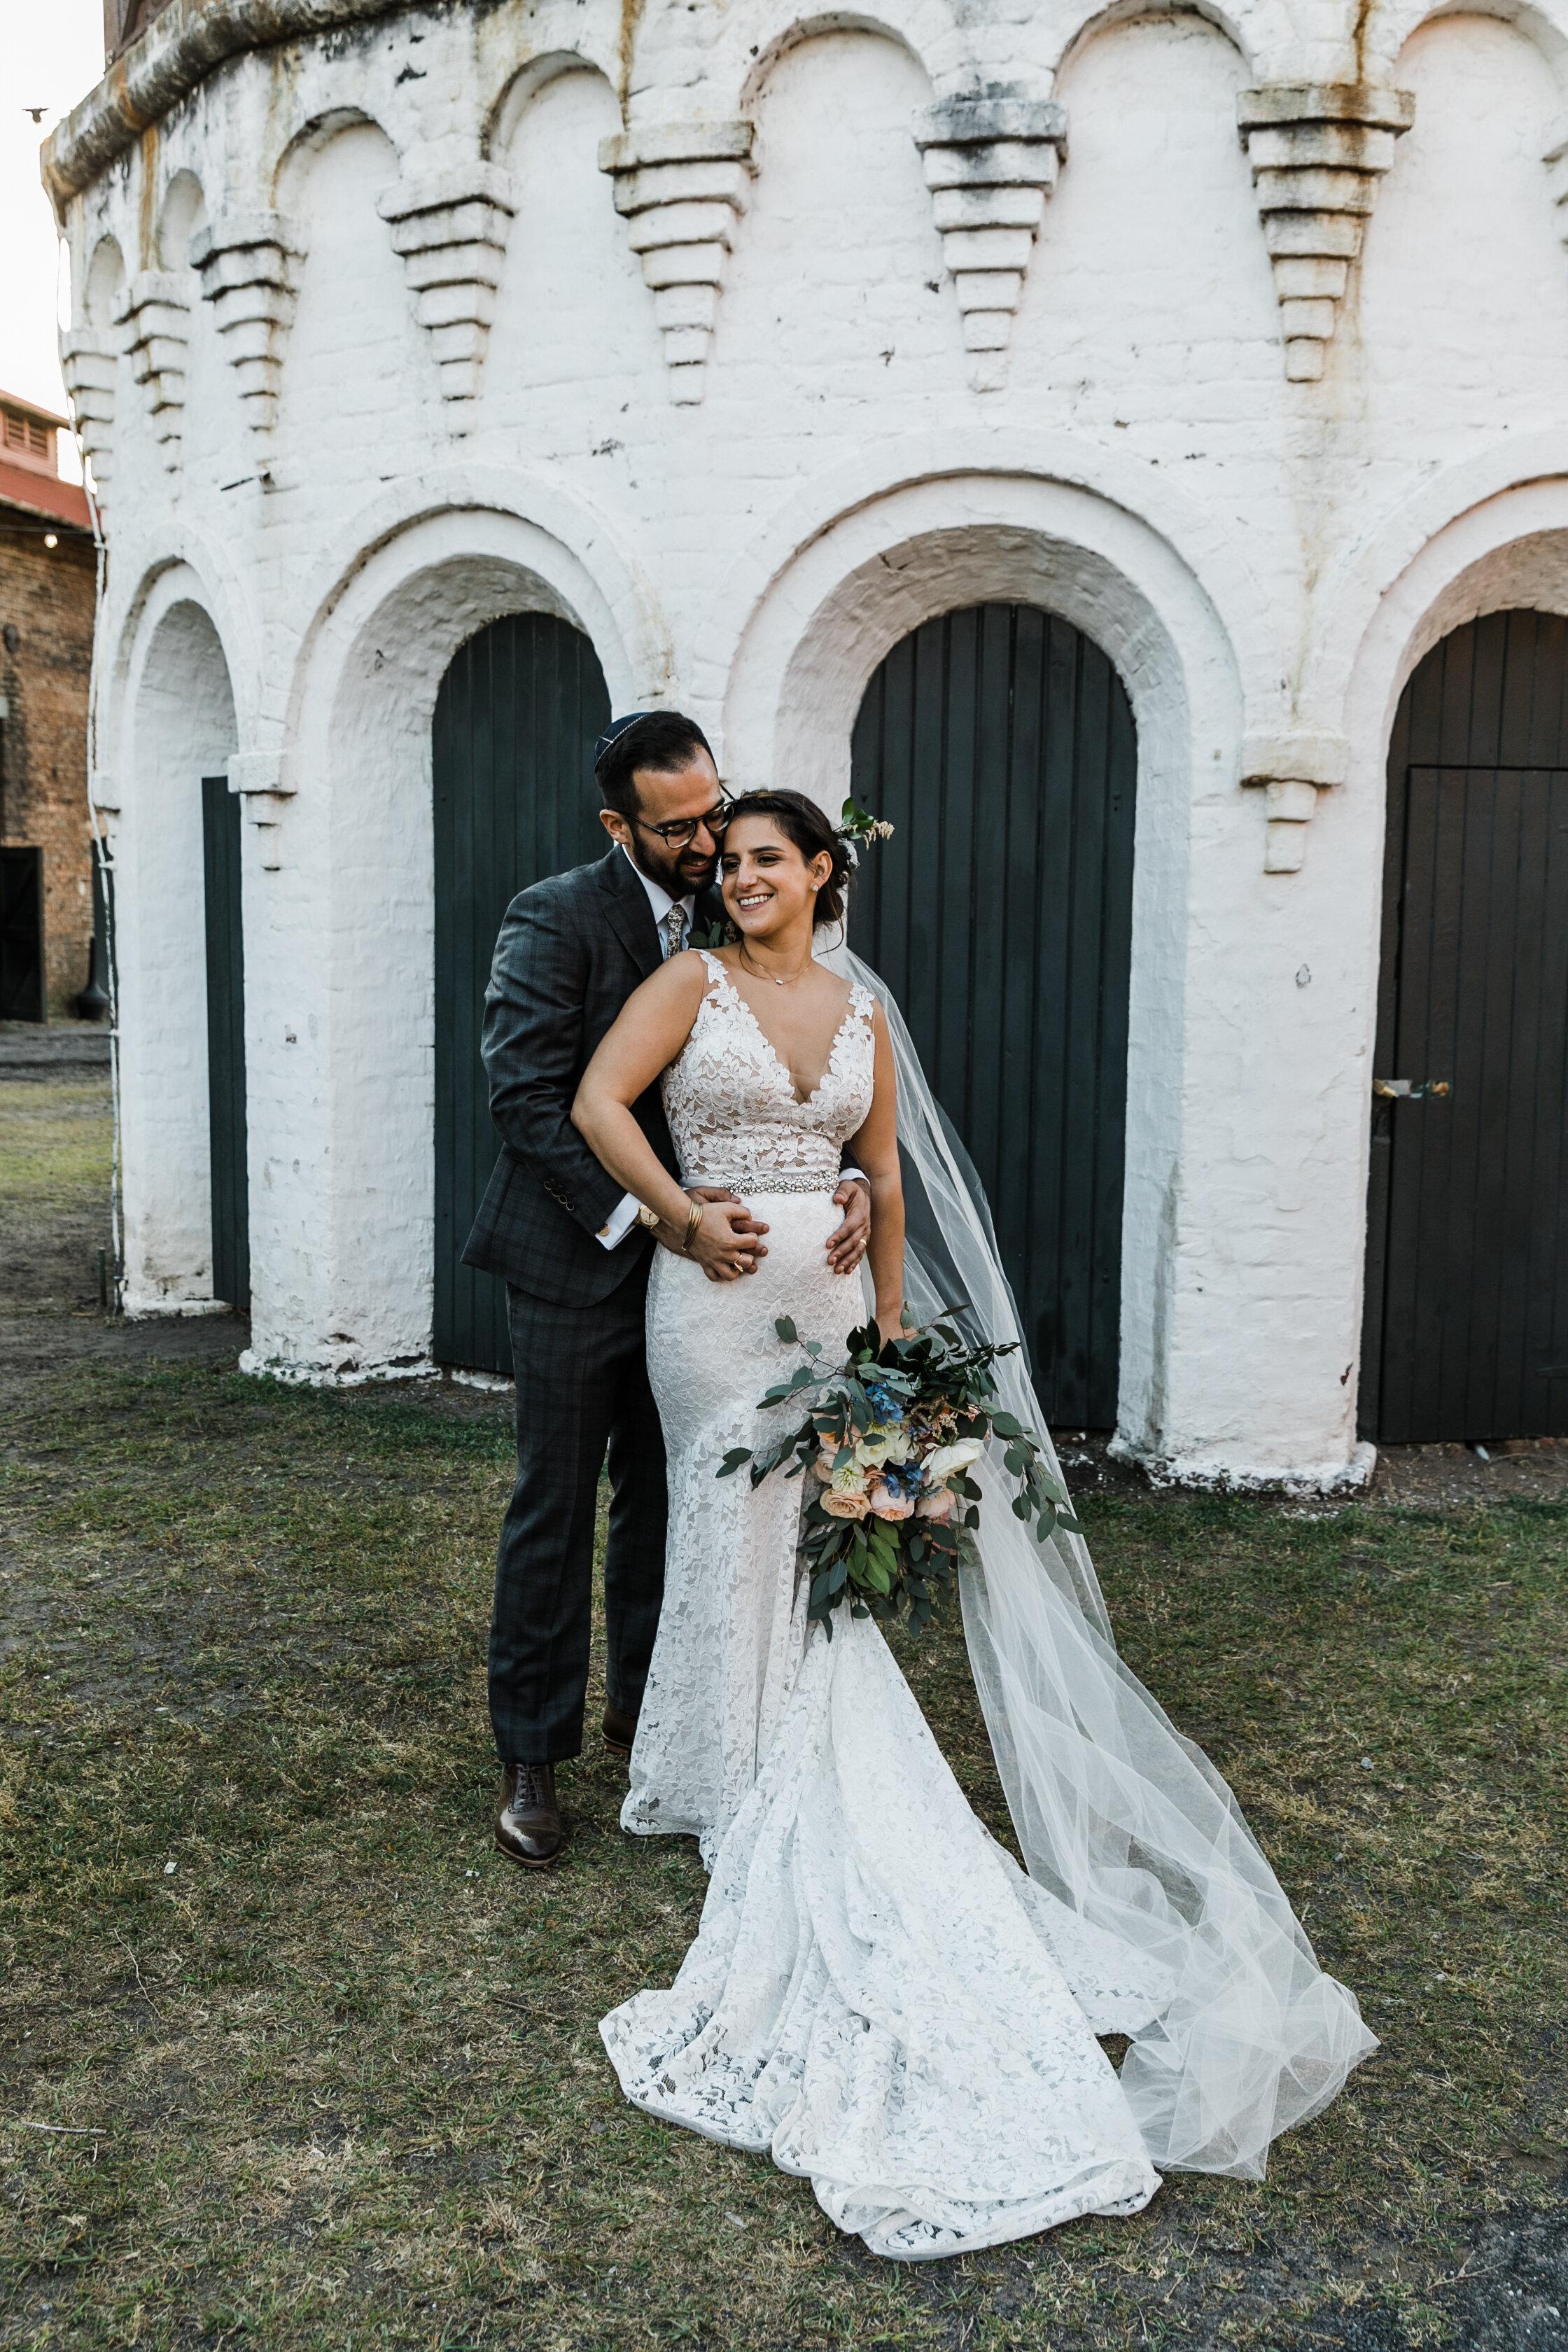 ivory-and-beau-blog-weddings-ivory-and-beau-couple-dominique-and-andres-savannah-florist-wedding-planning-savannah-bridal-boutique-wedding-flowers-KIP_WEBERWEDDING_RAILROADMUSEUM-1310.JPG